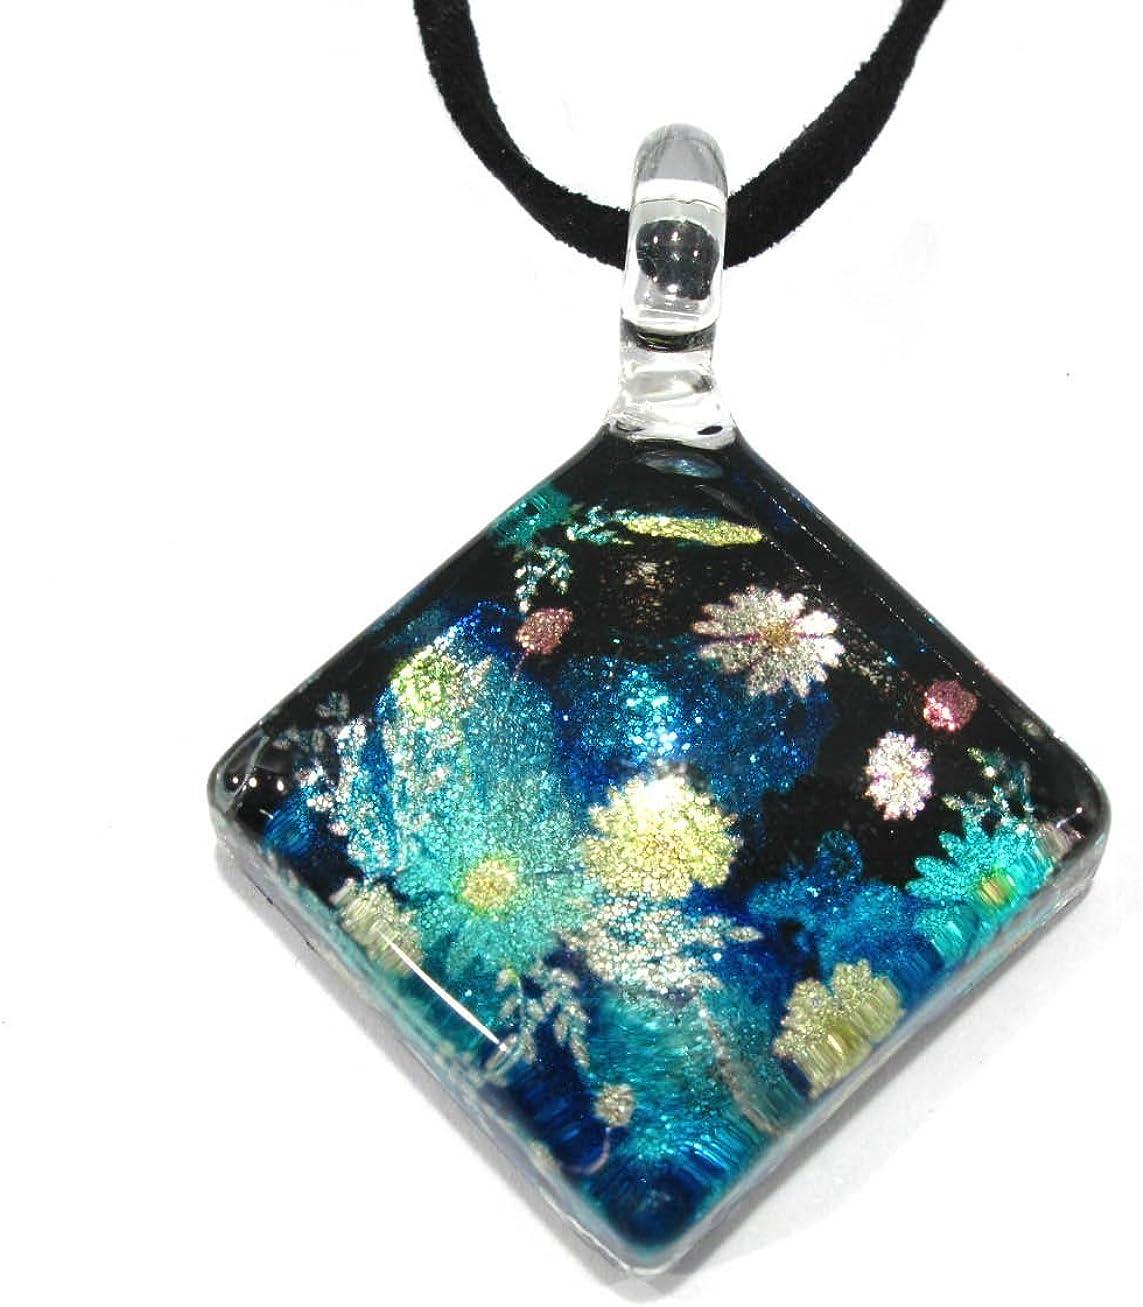 Handmade Square Glass Pendant Glass Blown Necklace Jewelry - No.1